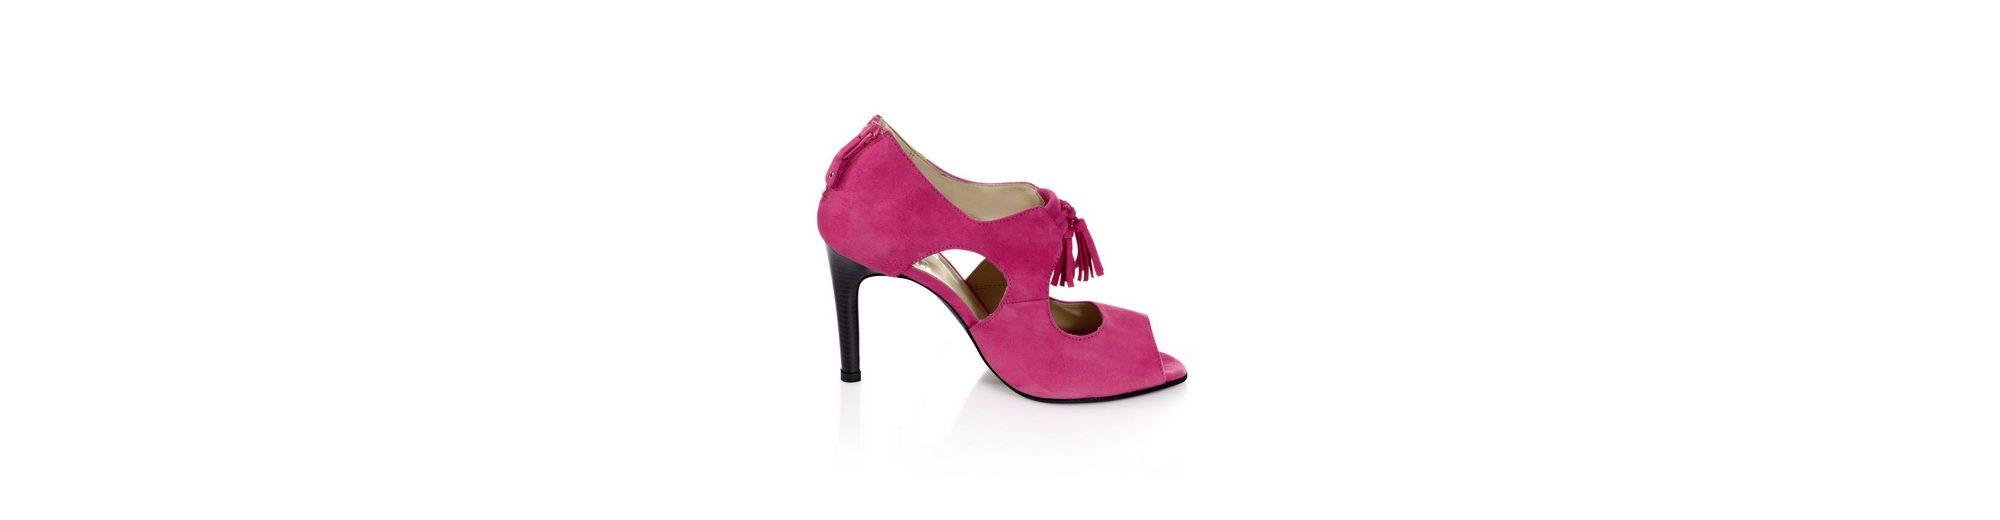 Alba Moda Sandalette in Ankle-Form Billig Verkauf Amazon Rabatt Neueste v6zAfm